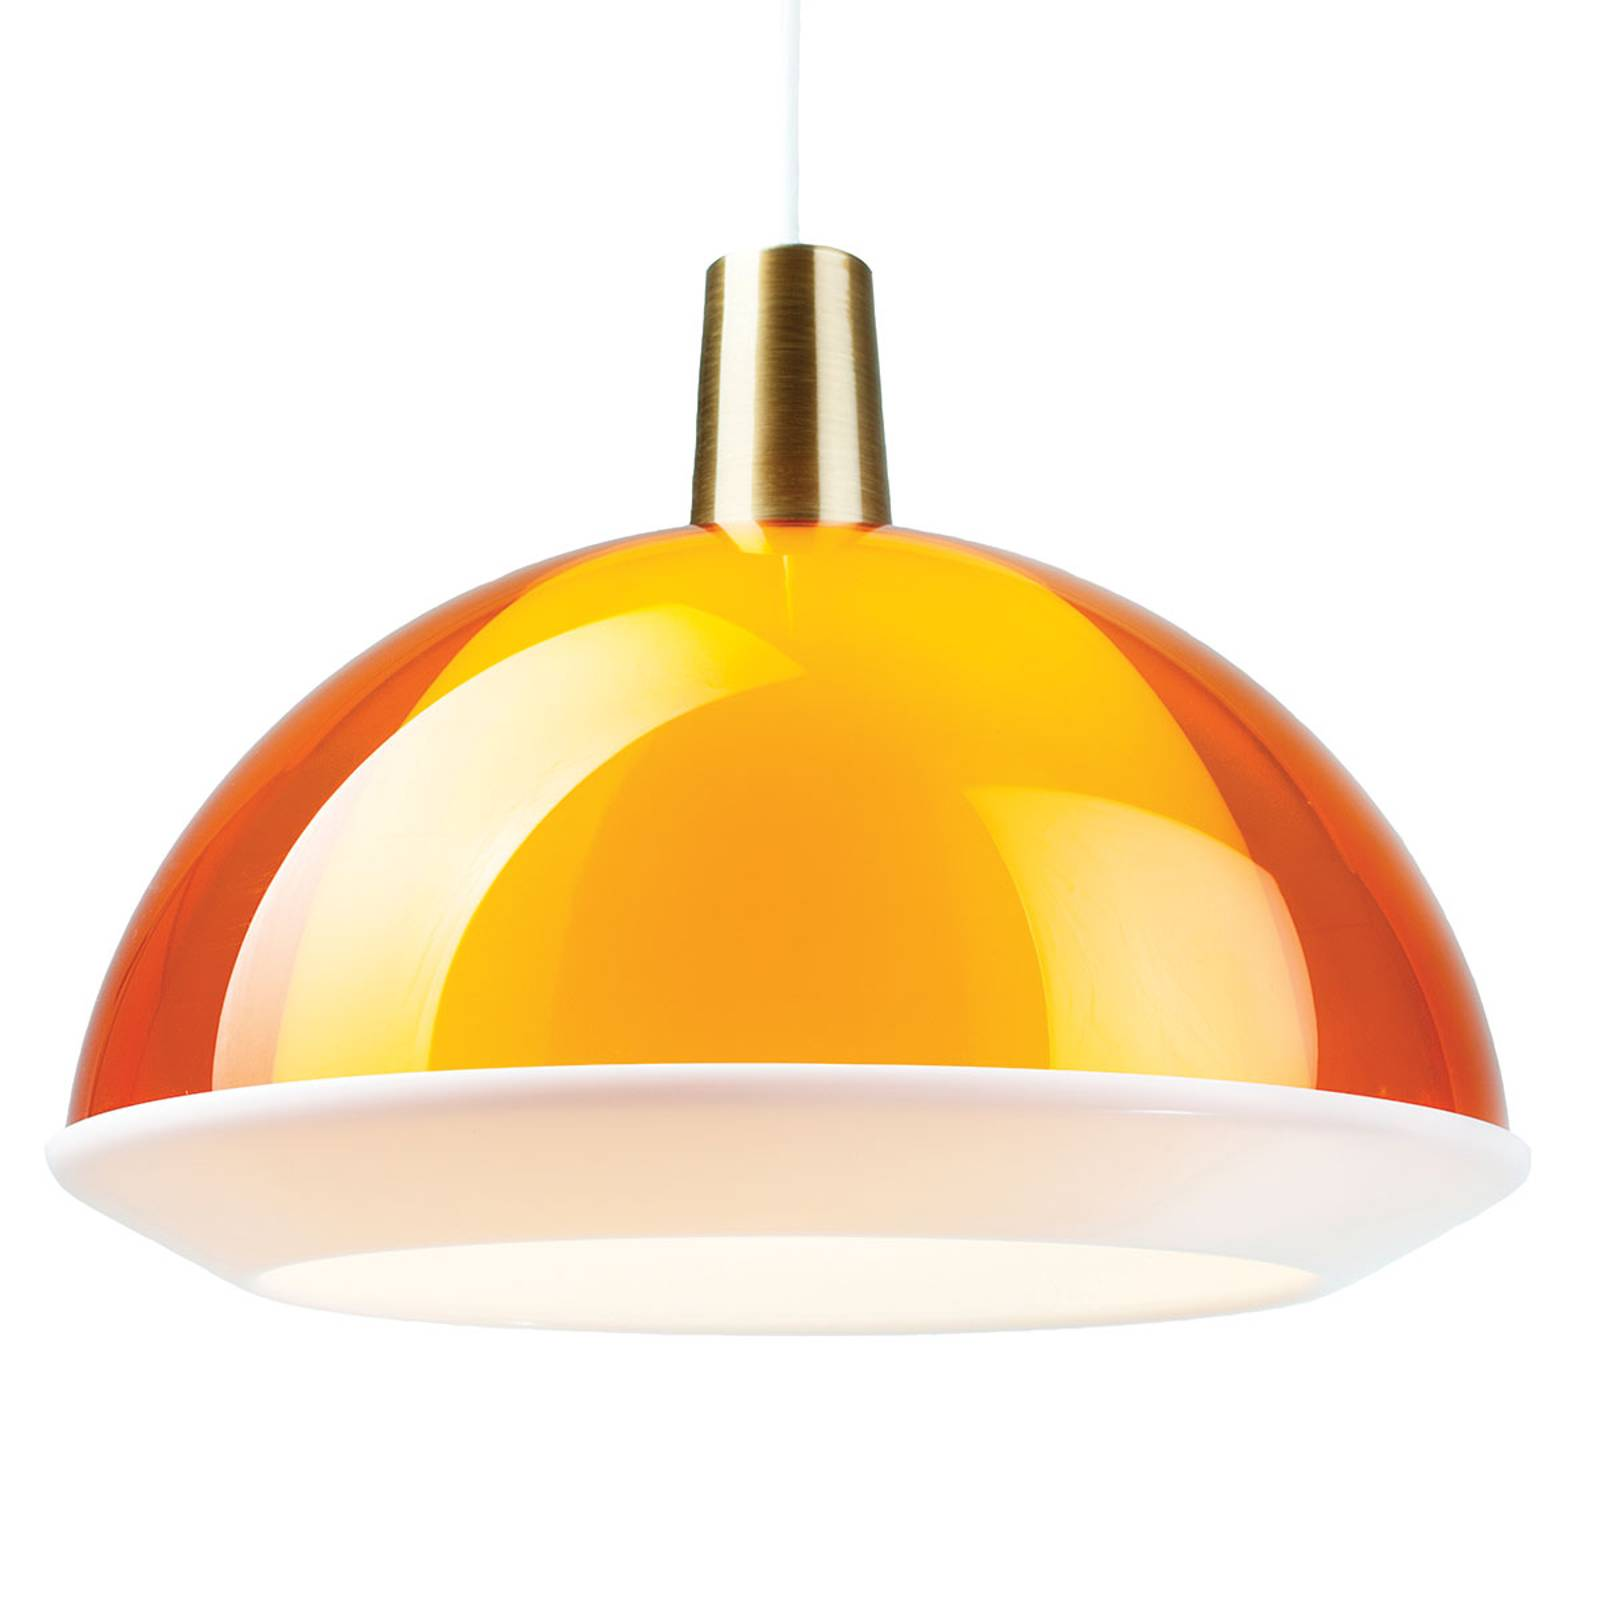 Innolux Kuplat 400 hanglamp 40 cm oranje